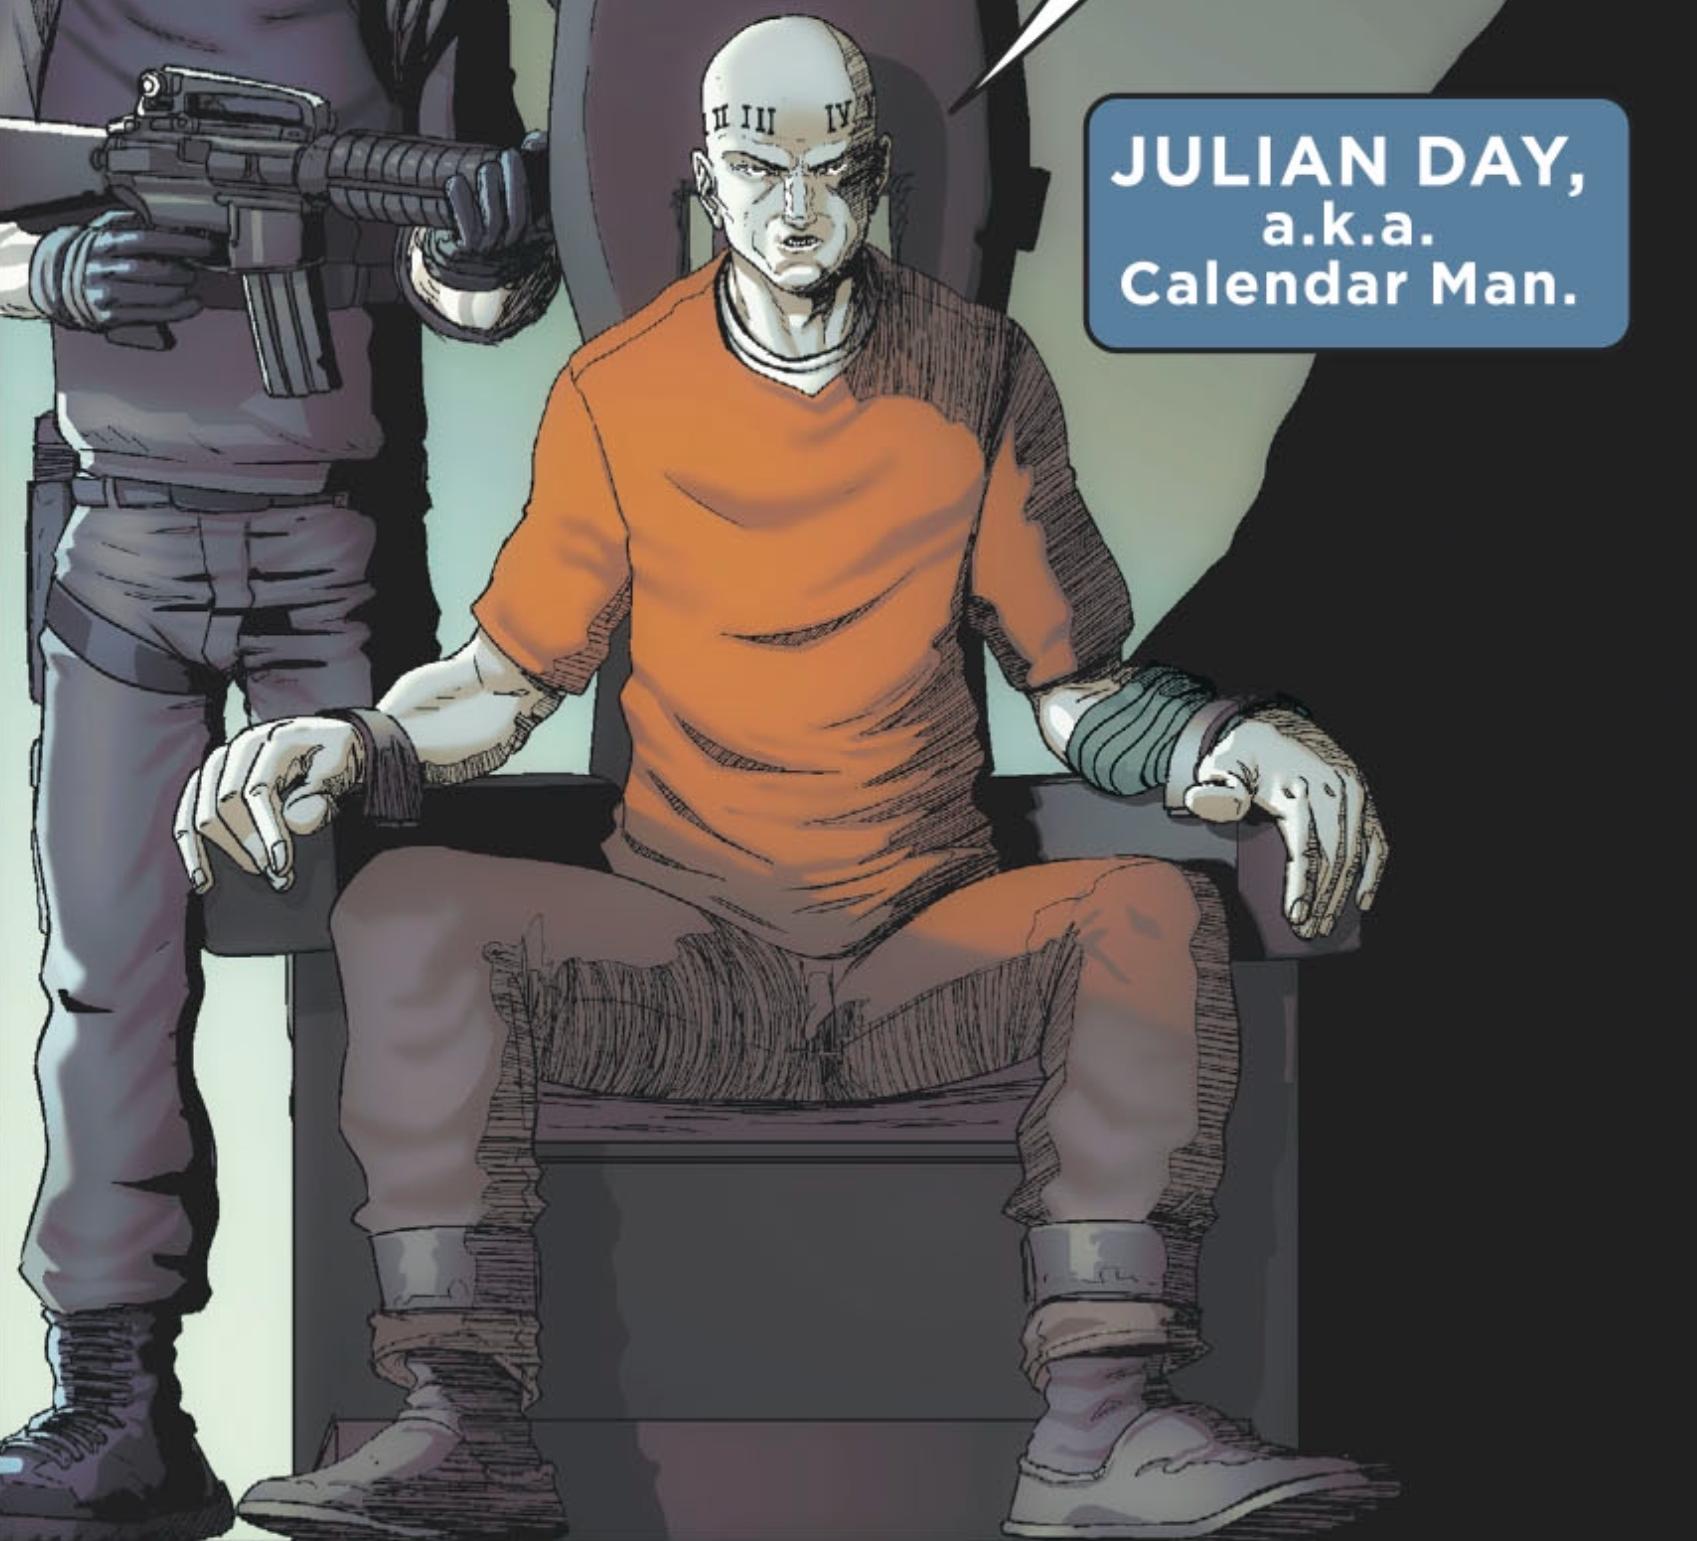 Calendar Man